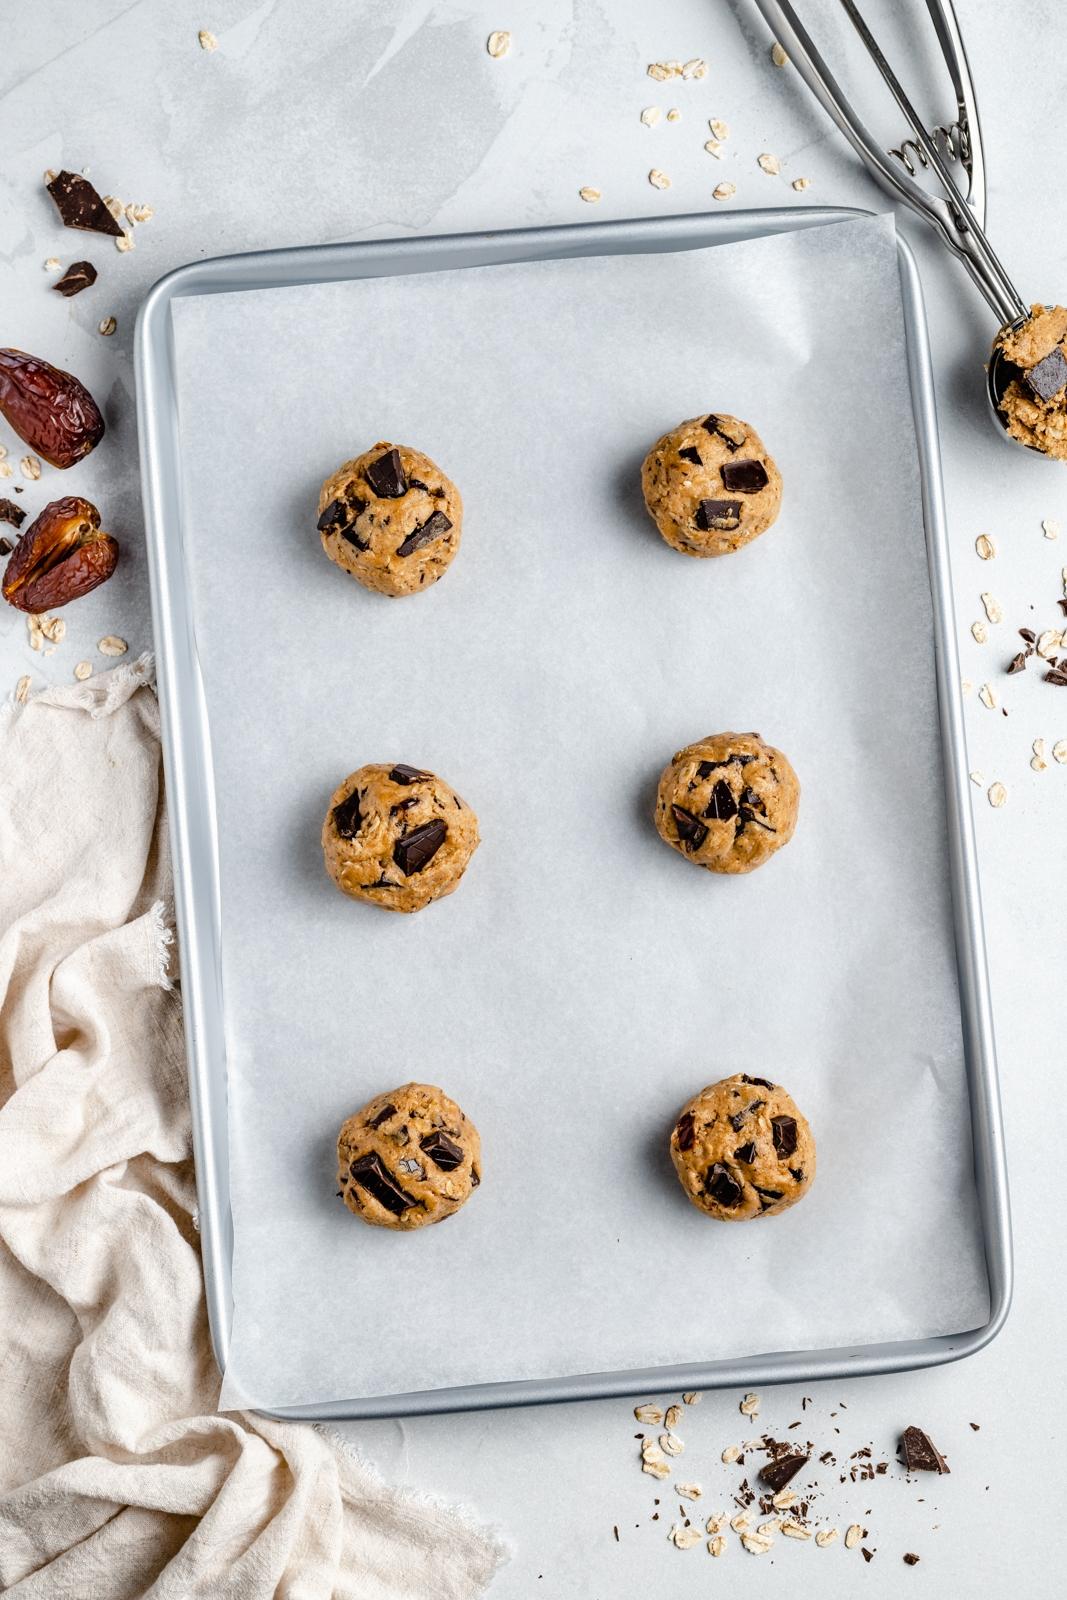 unbaked tahini date chocolate chunk oatmeal cookies on a baking sheet